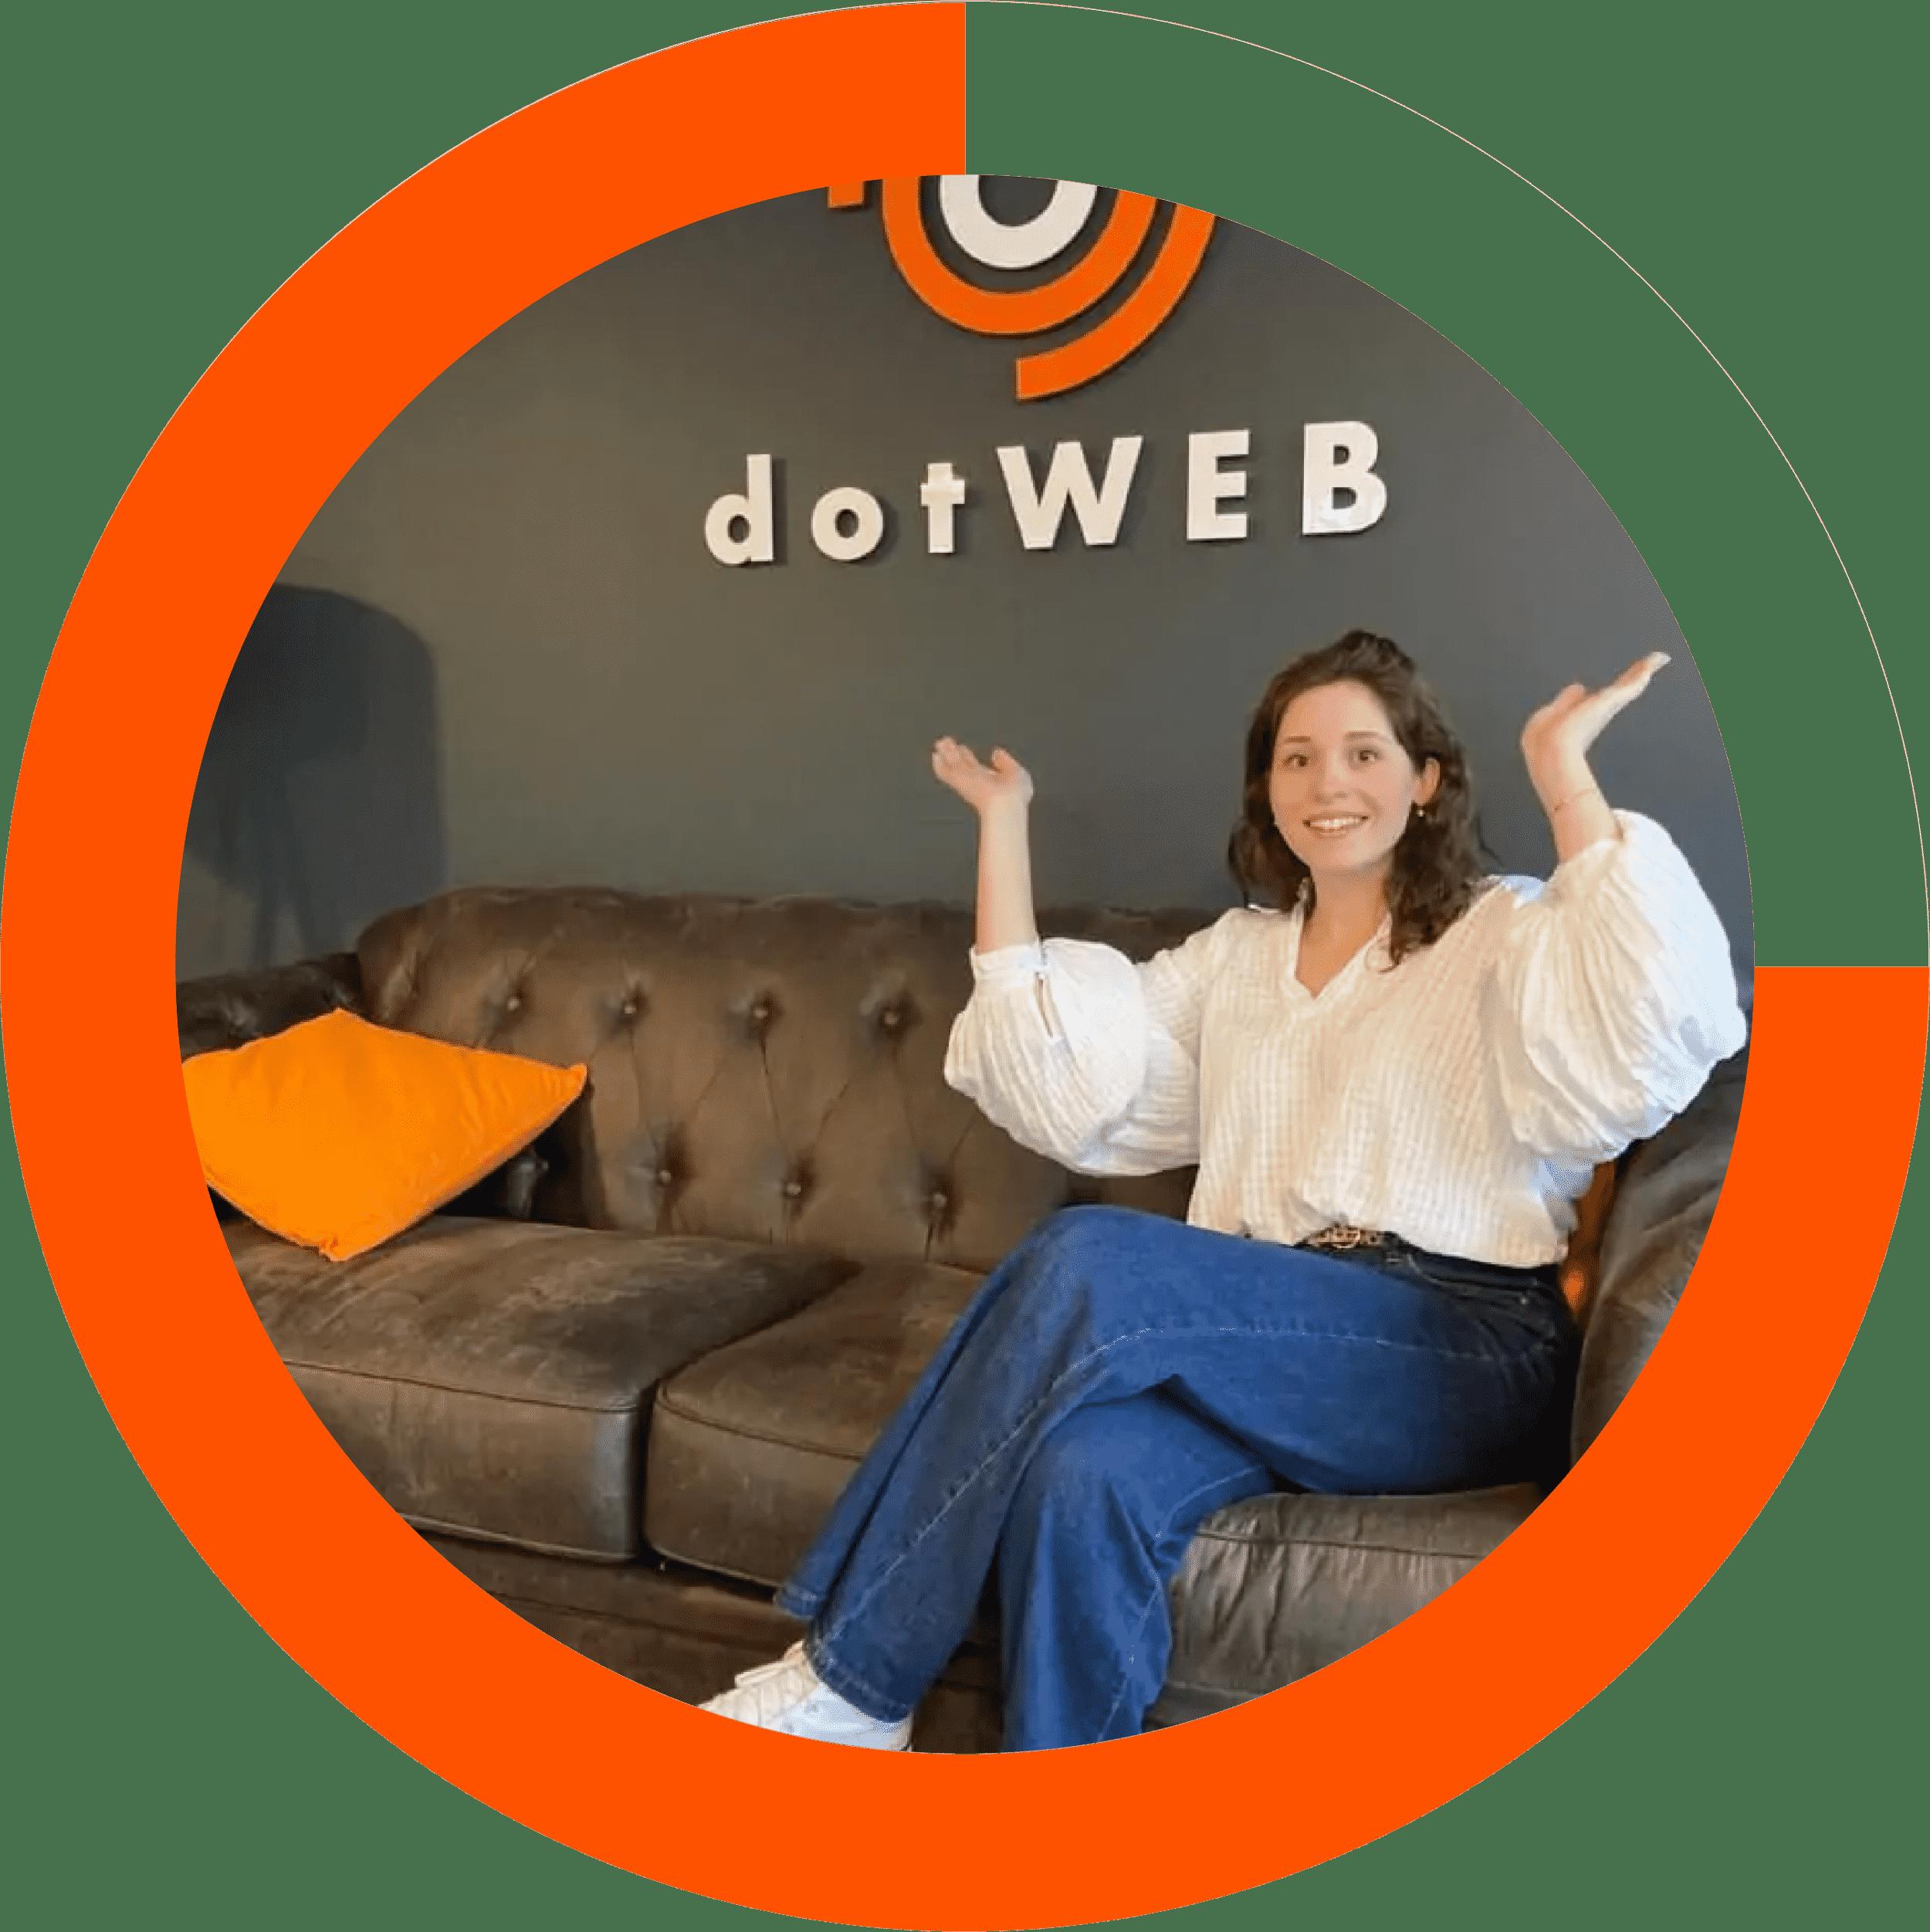 dotweb marketing Amélie Mols